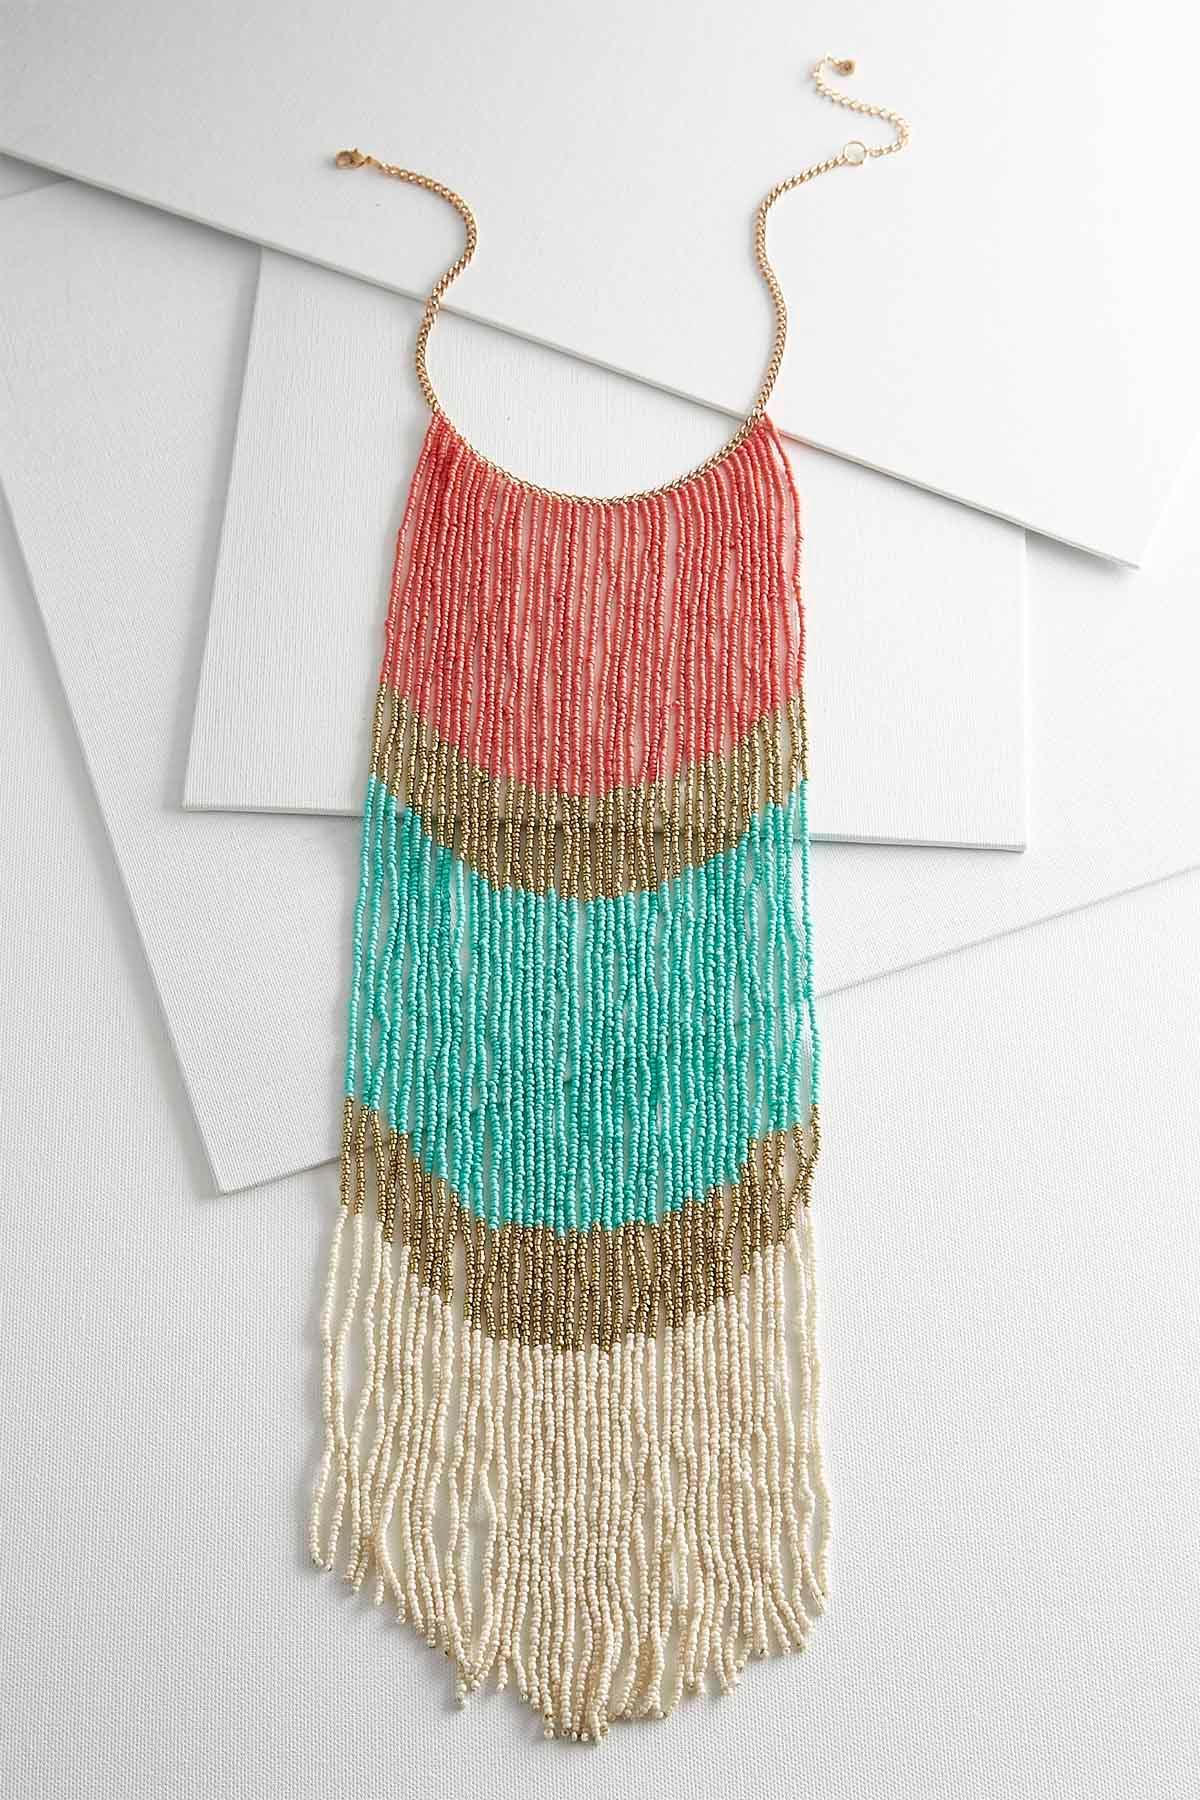 Long Colorblock Fringe Necklace